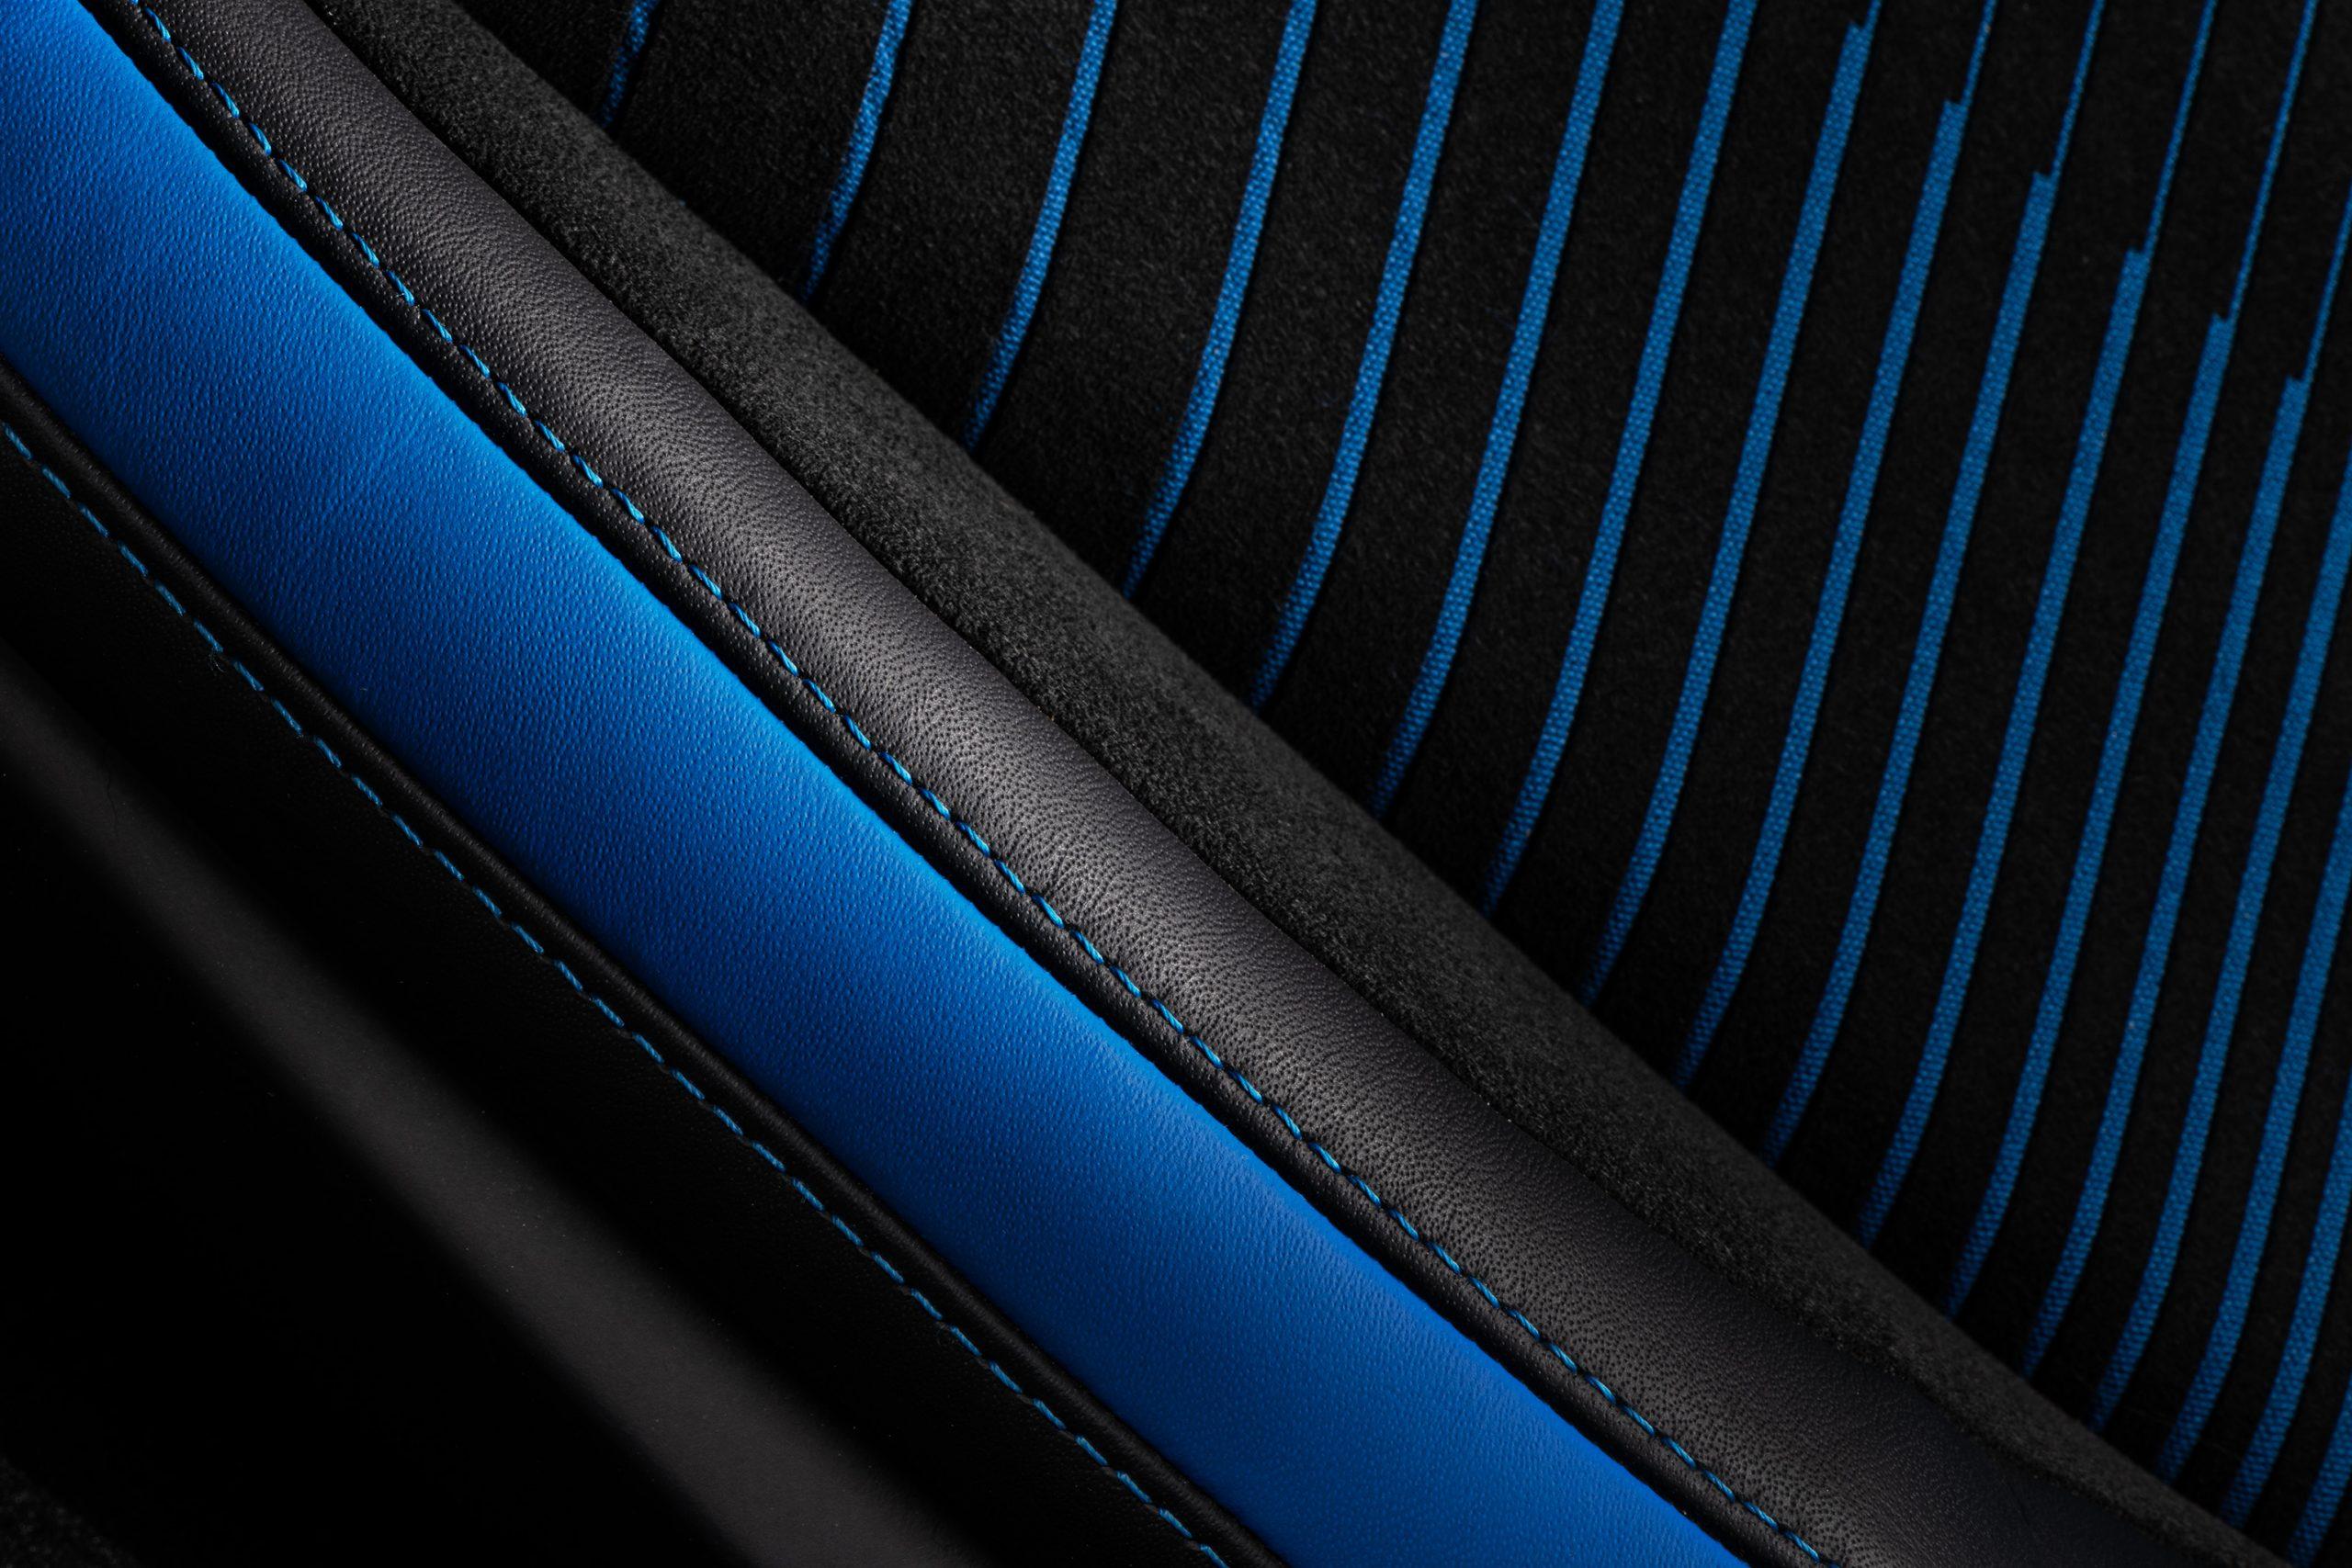 Maserati MC20 interior leather seat alcantara